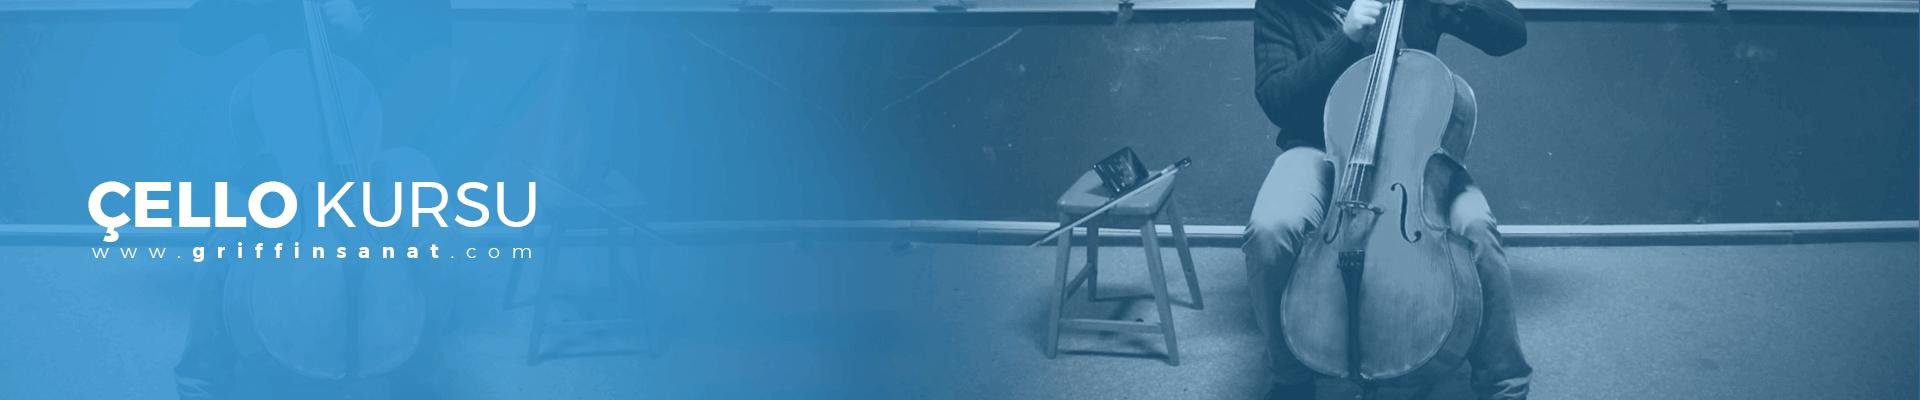 cello-kursu-izmir